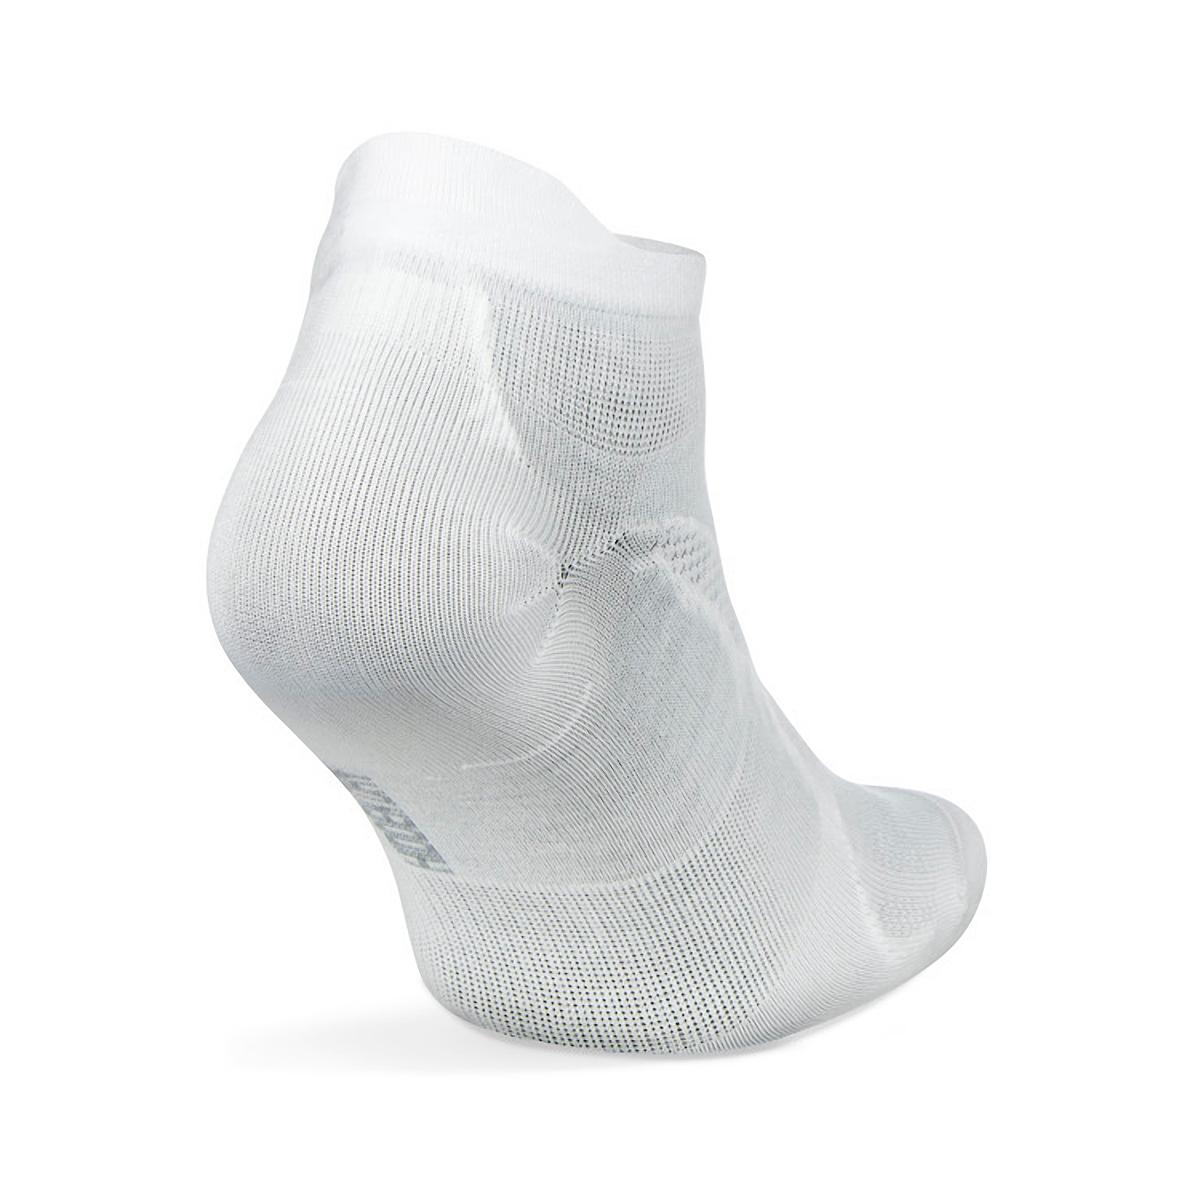 Balega Hidden Dry No Show Socks, , large, image 4